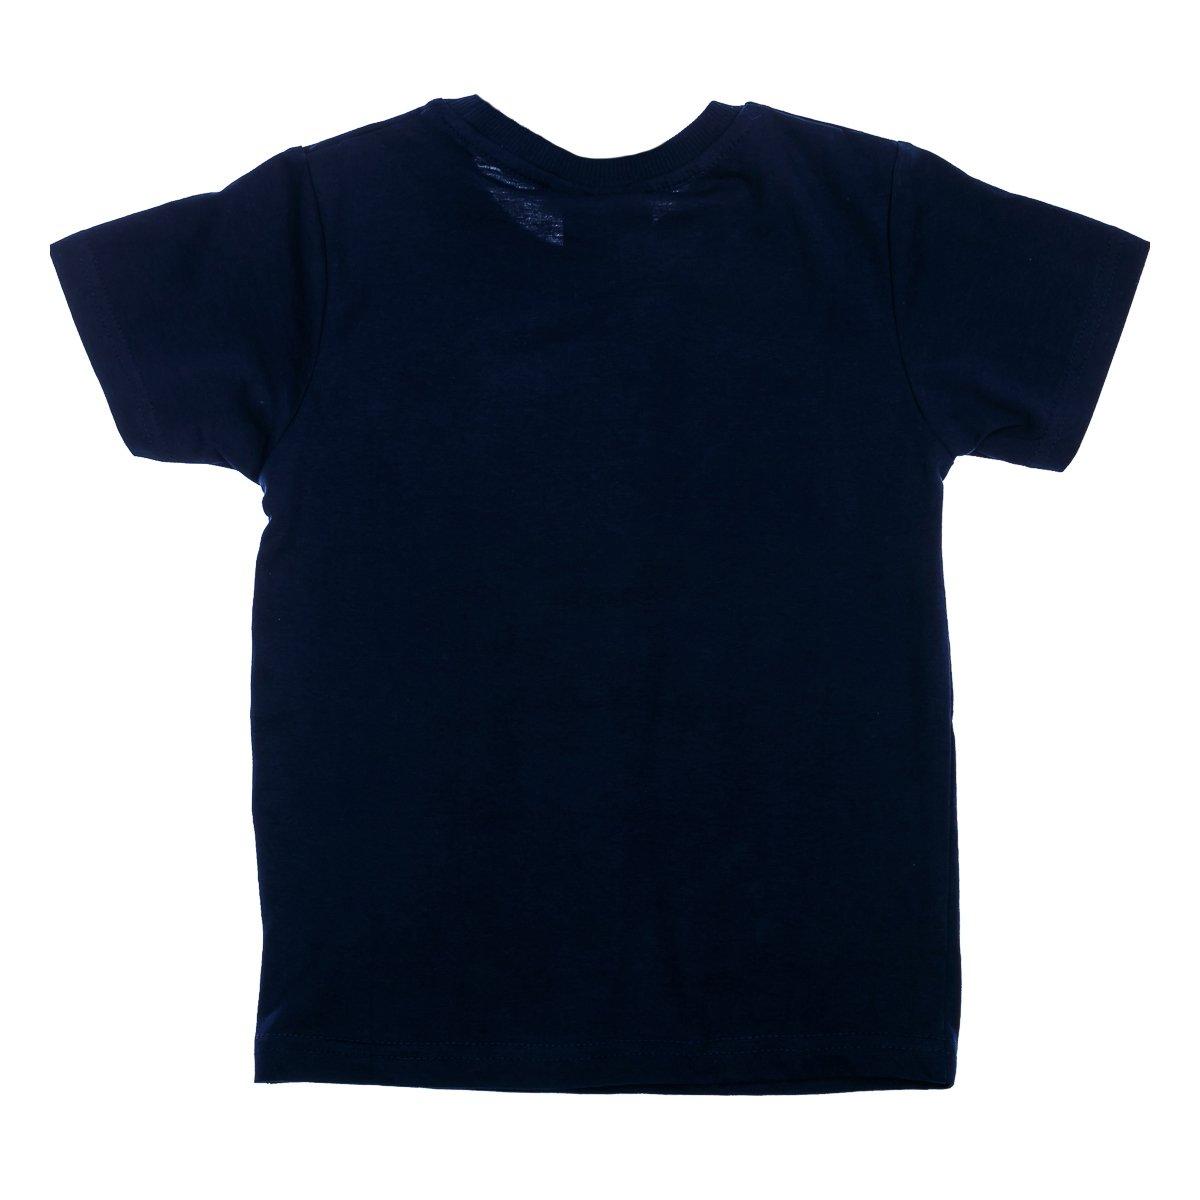 Купить Футболки, майки, топы, туники, Футболка E Plus M Batman Blue, р. 152 BAT5202184 ТМ: E Plus M, синий